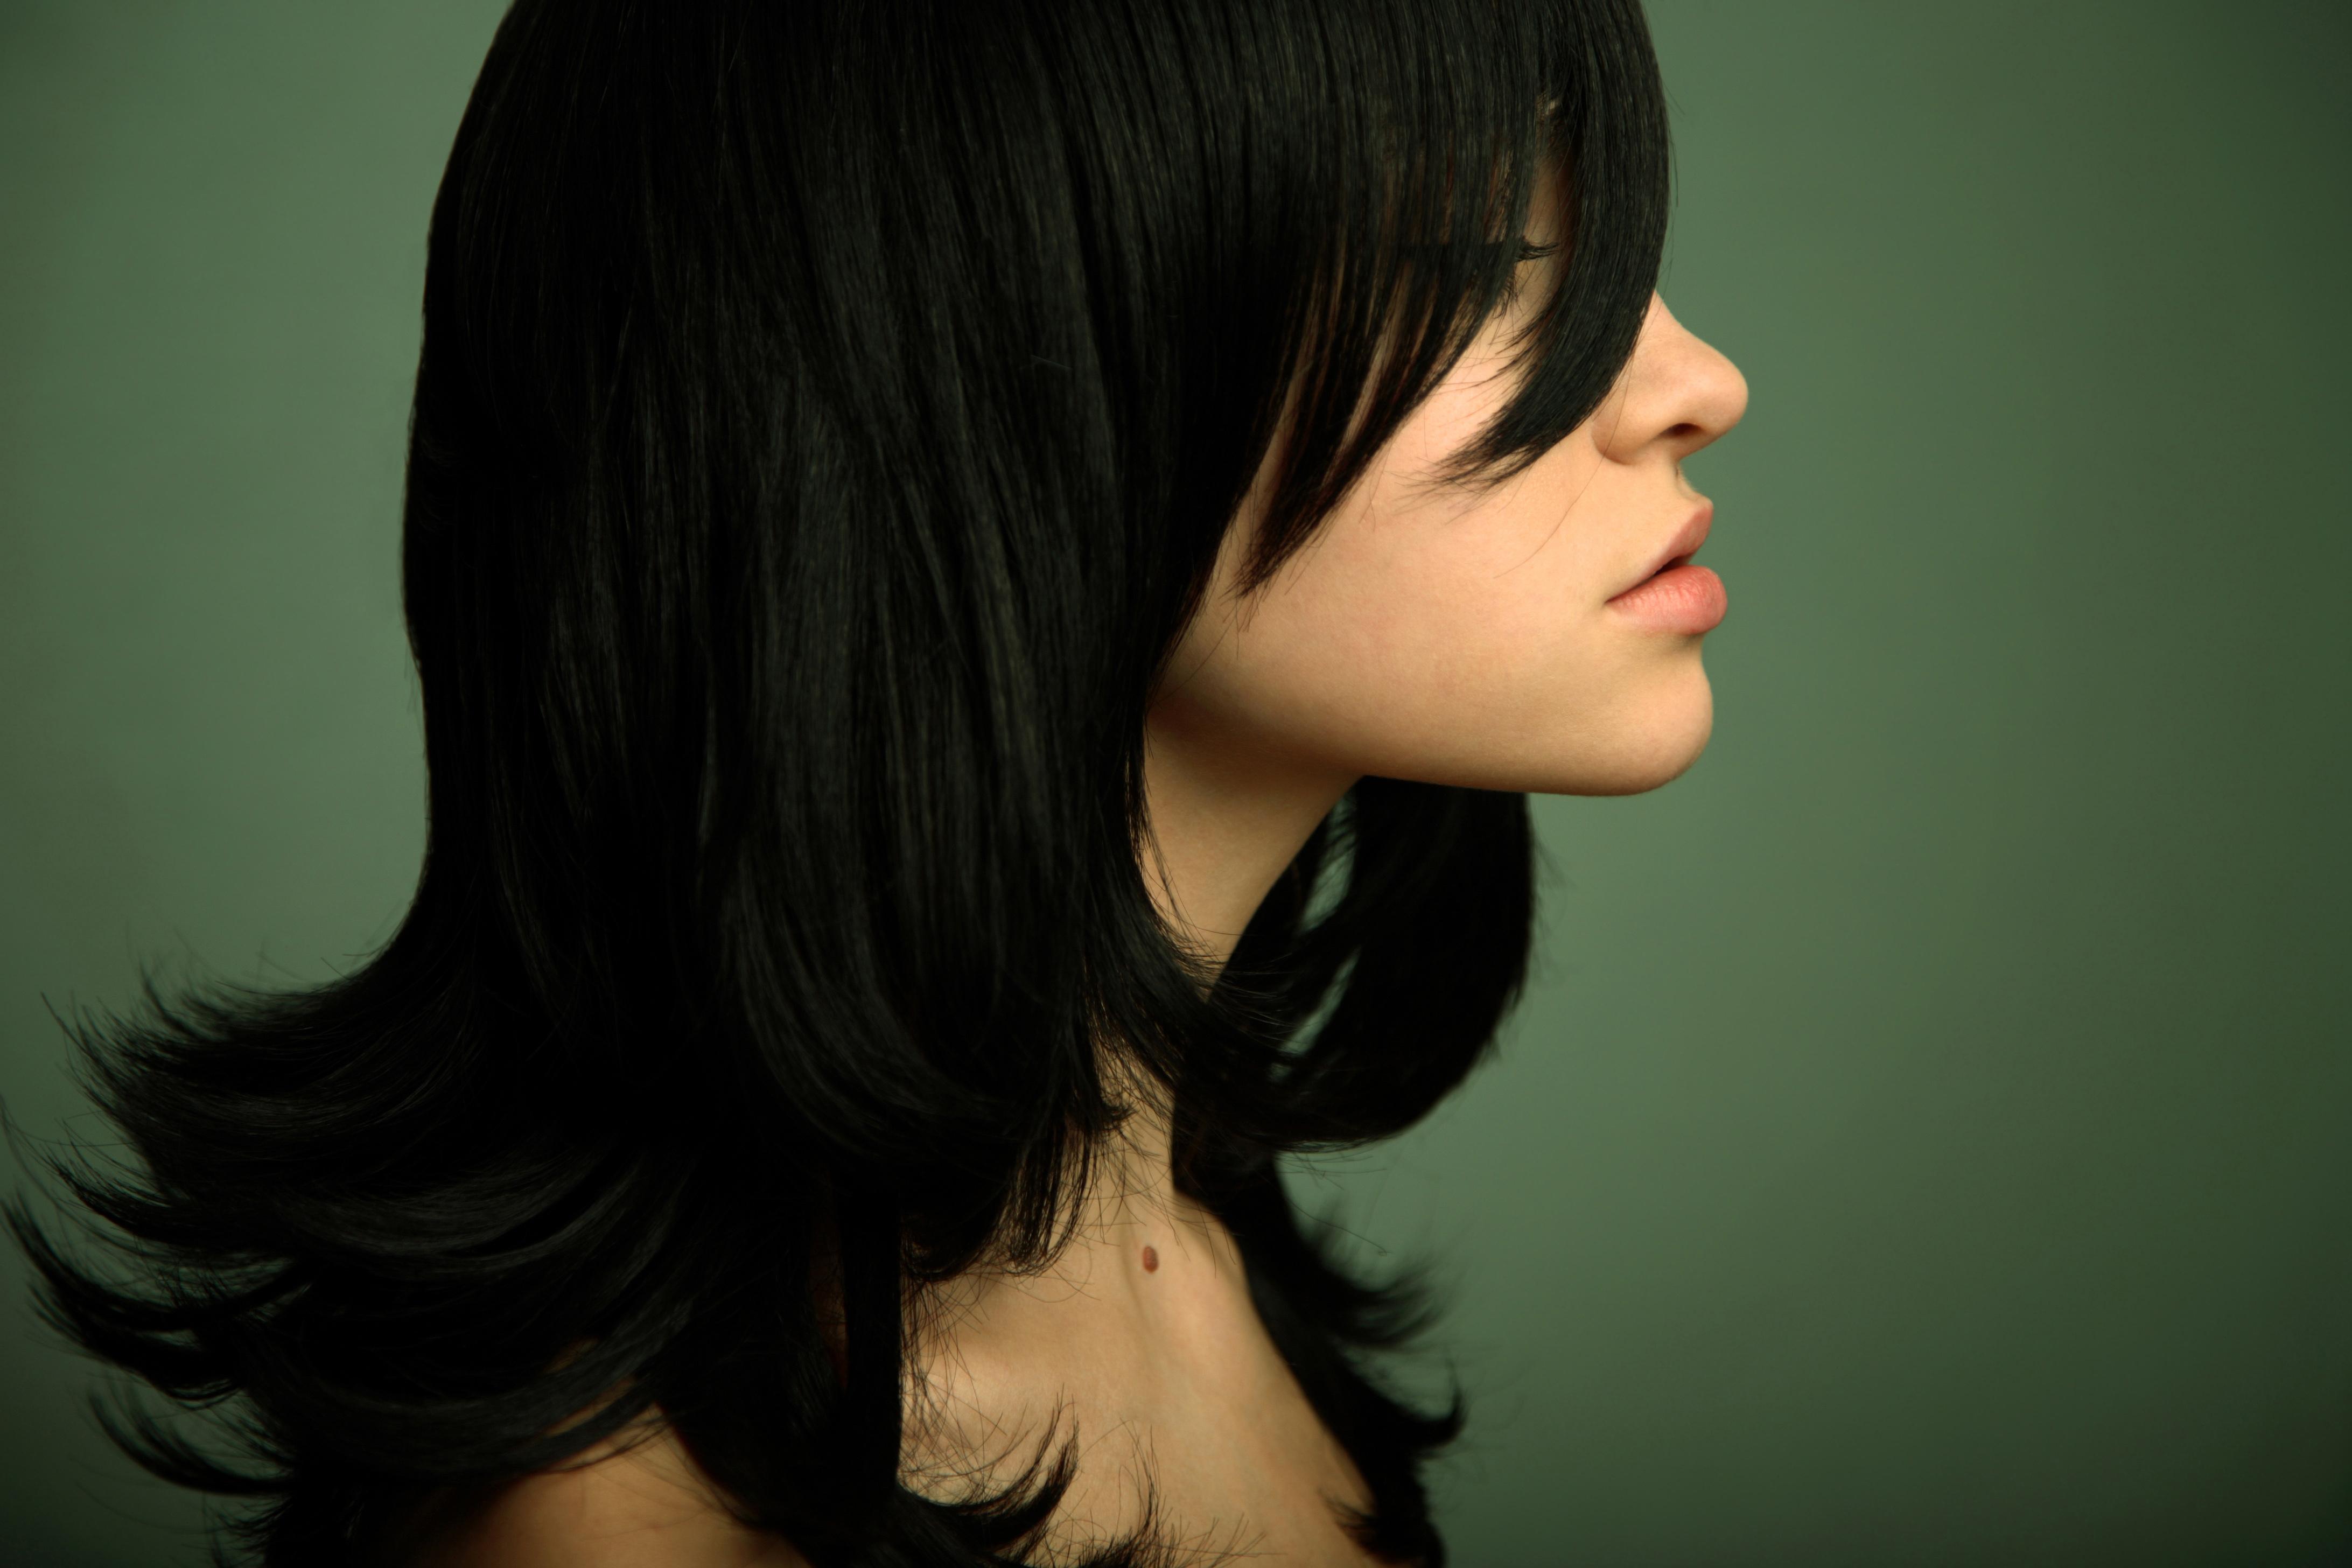 Фото на аву для девушек короткая стрижка